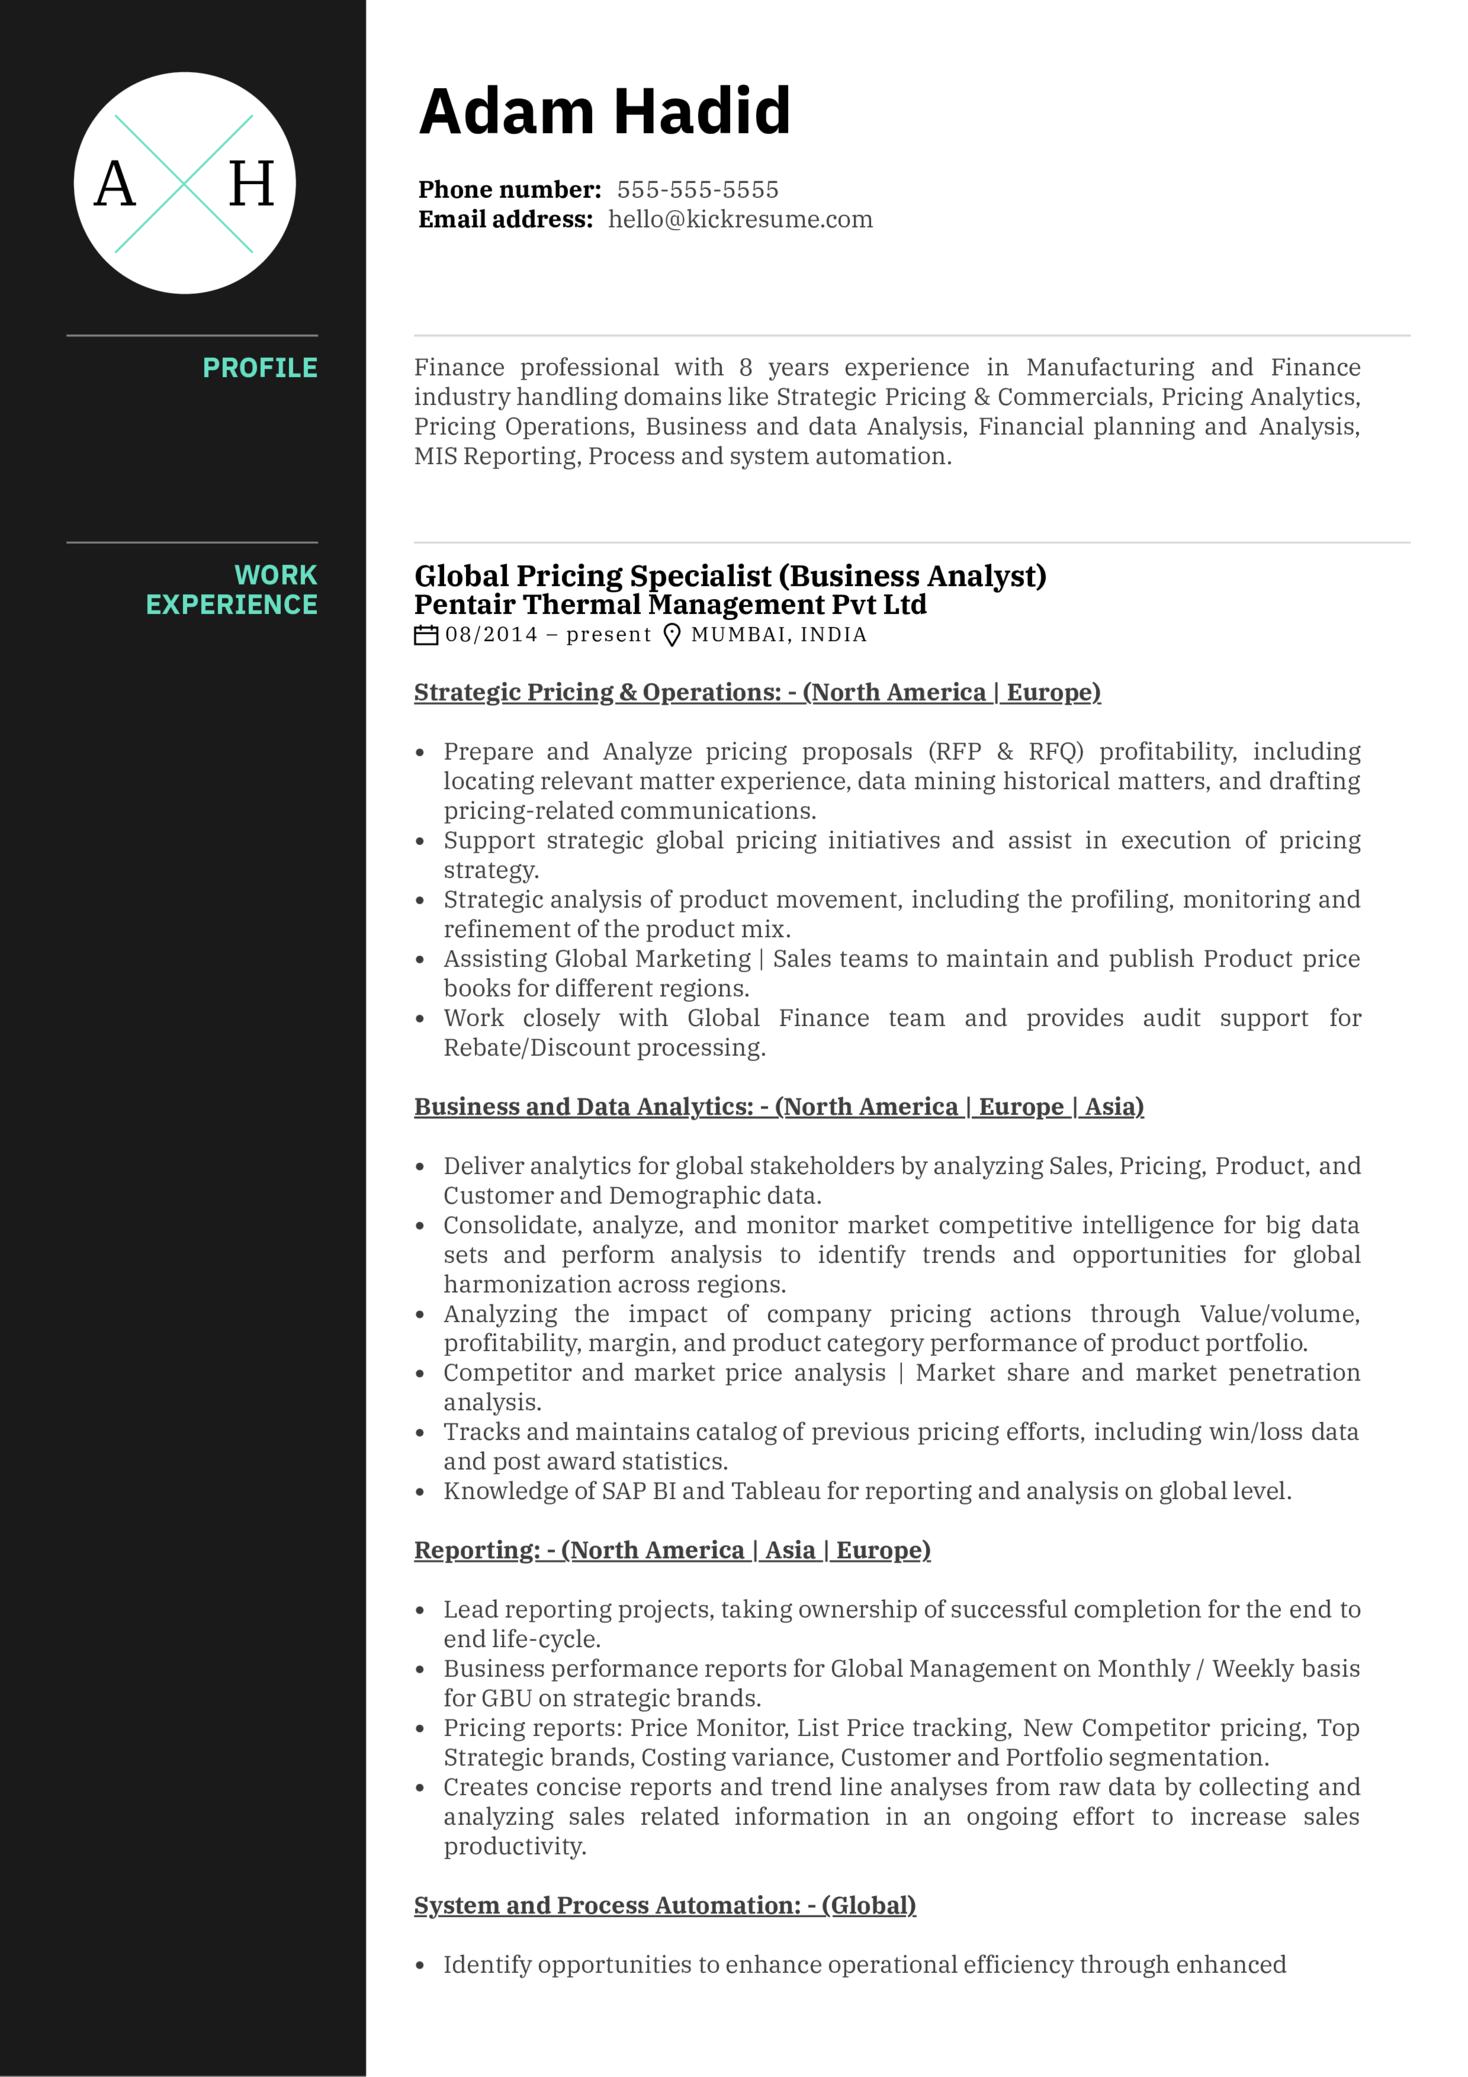 Honeywell Pricing Analyst Resume Example (Parte 1)